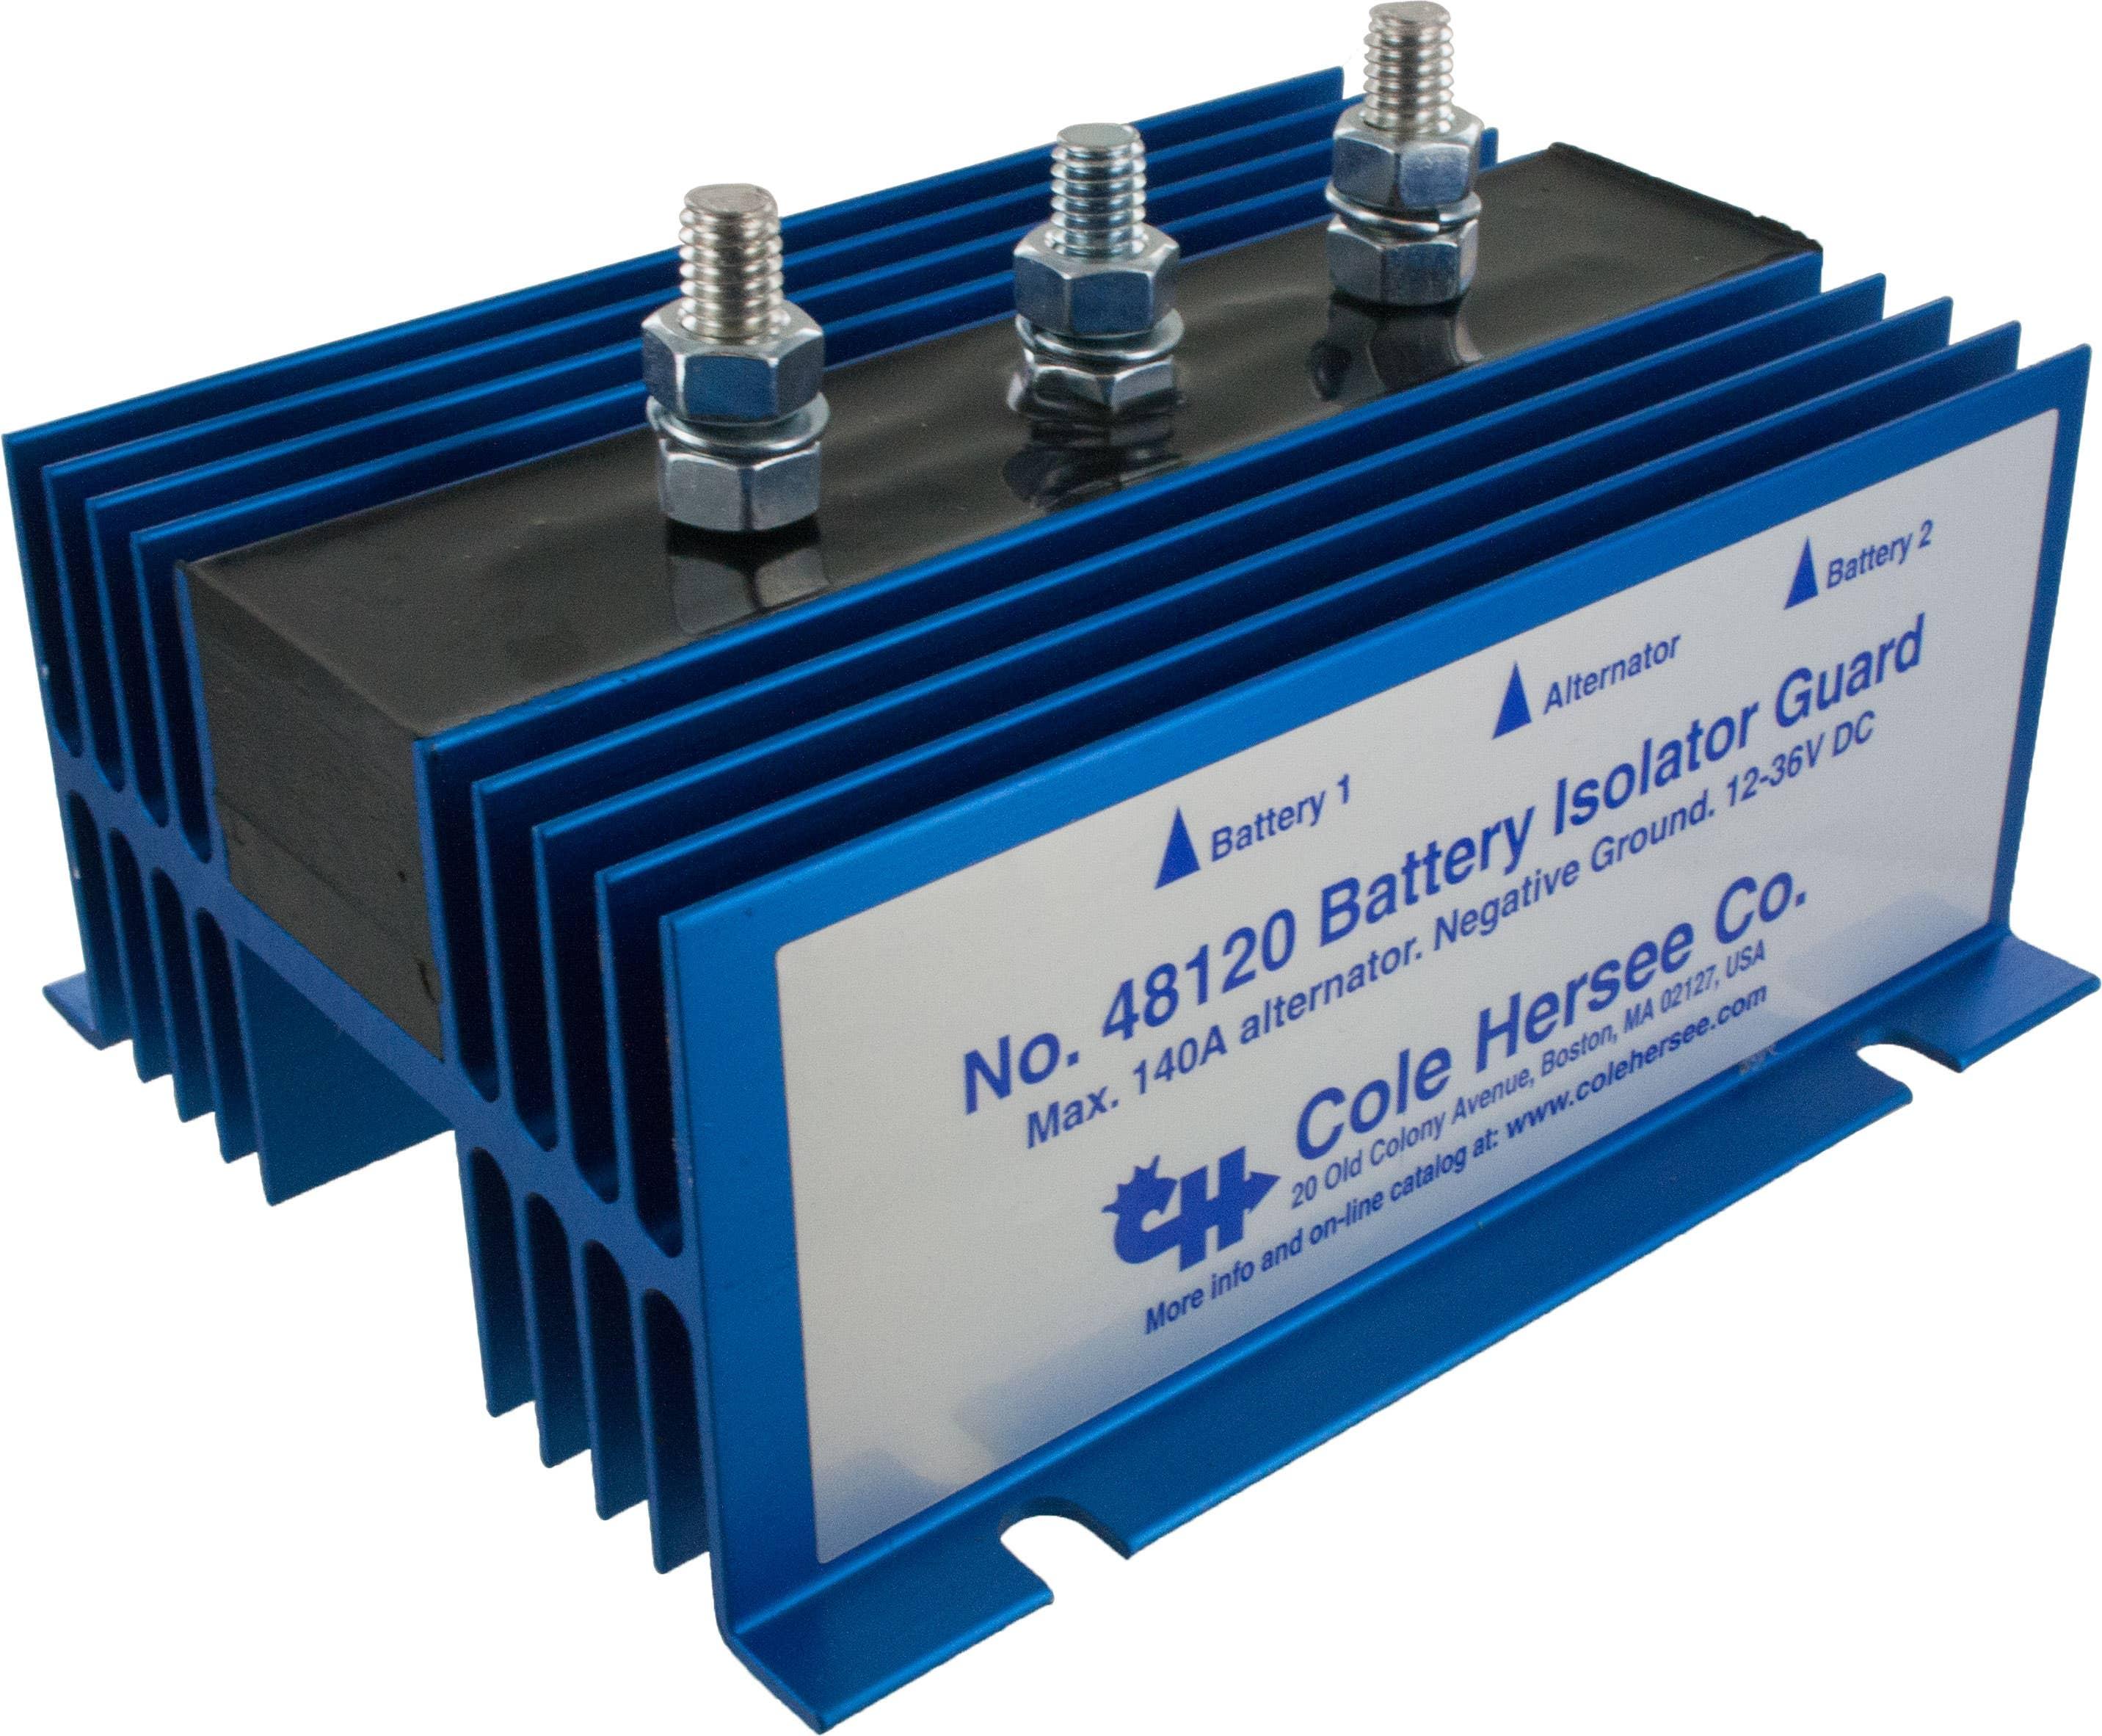 Cole Hersee 48120 Battery Isolator Elecdirect Marine Further 2 Alternator 3 Wiring